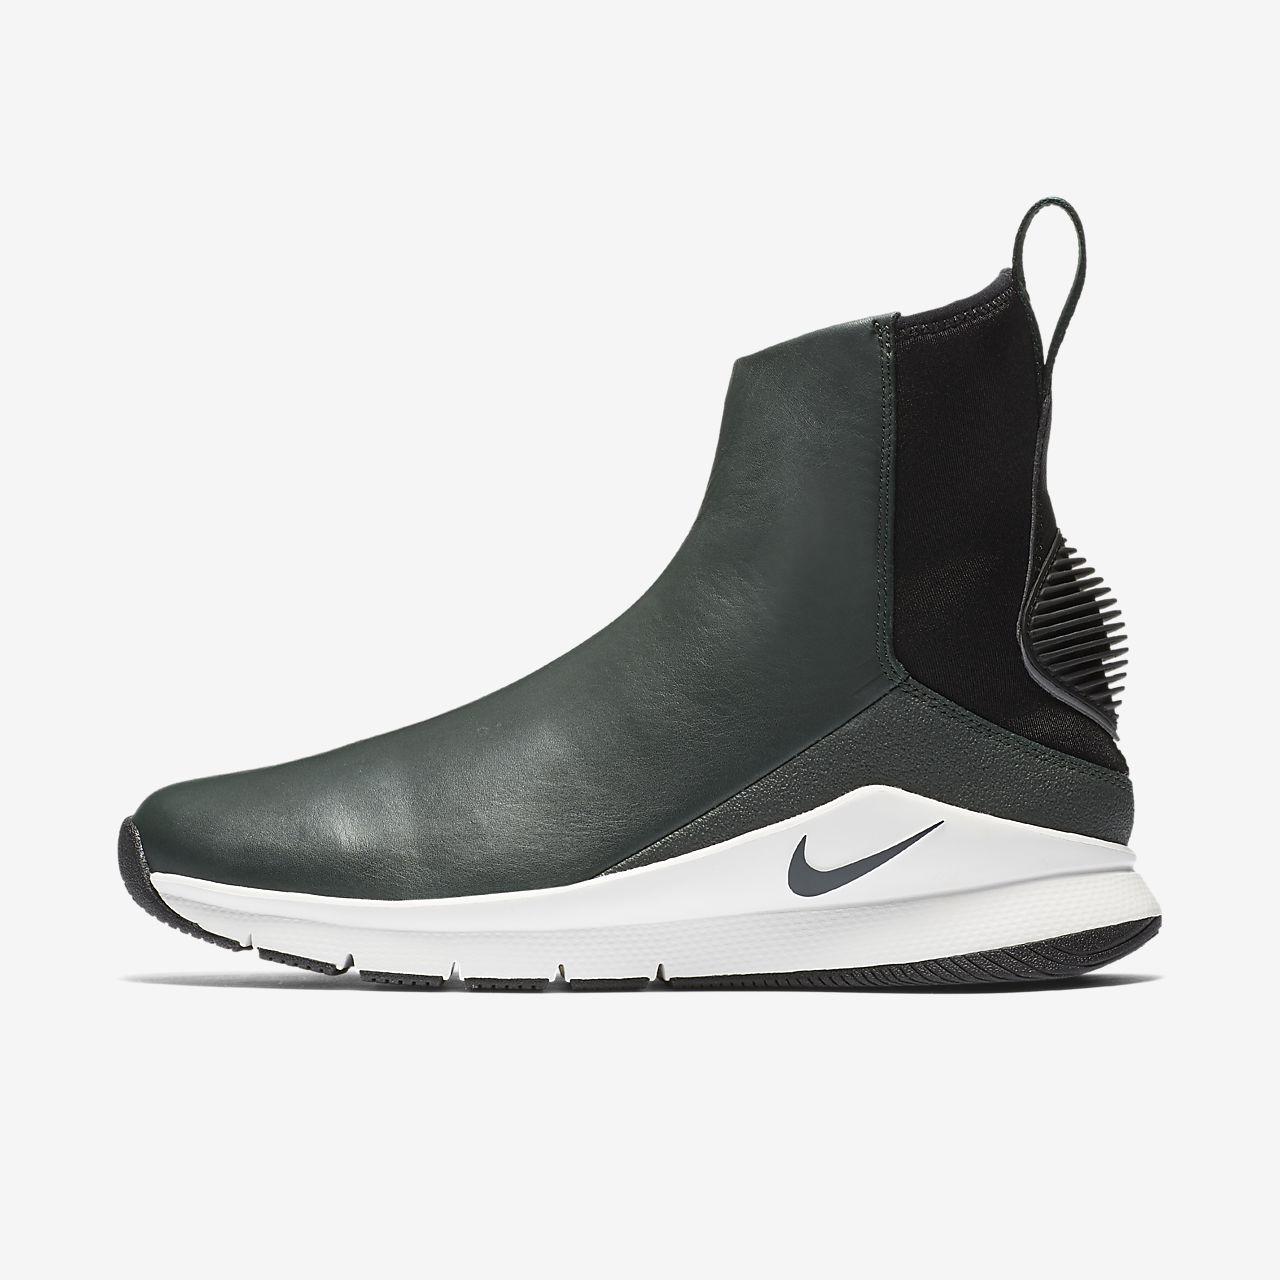 Nike Rivah High Premium Womens Boot